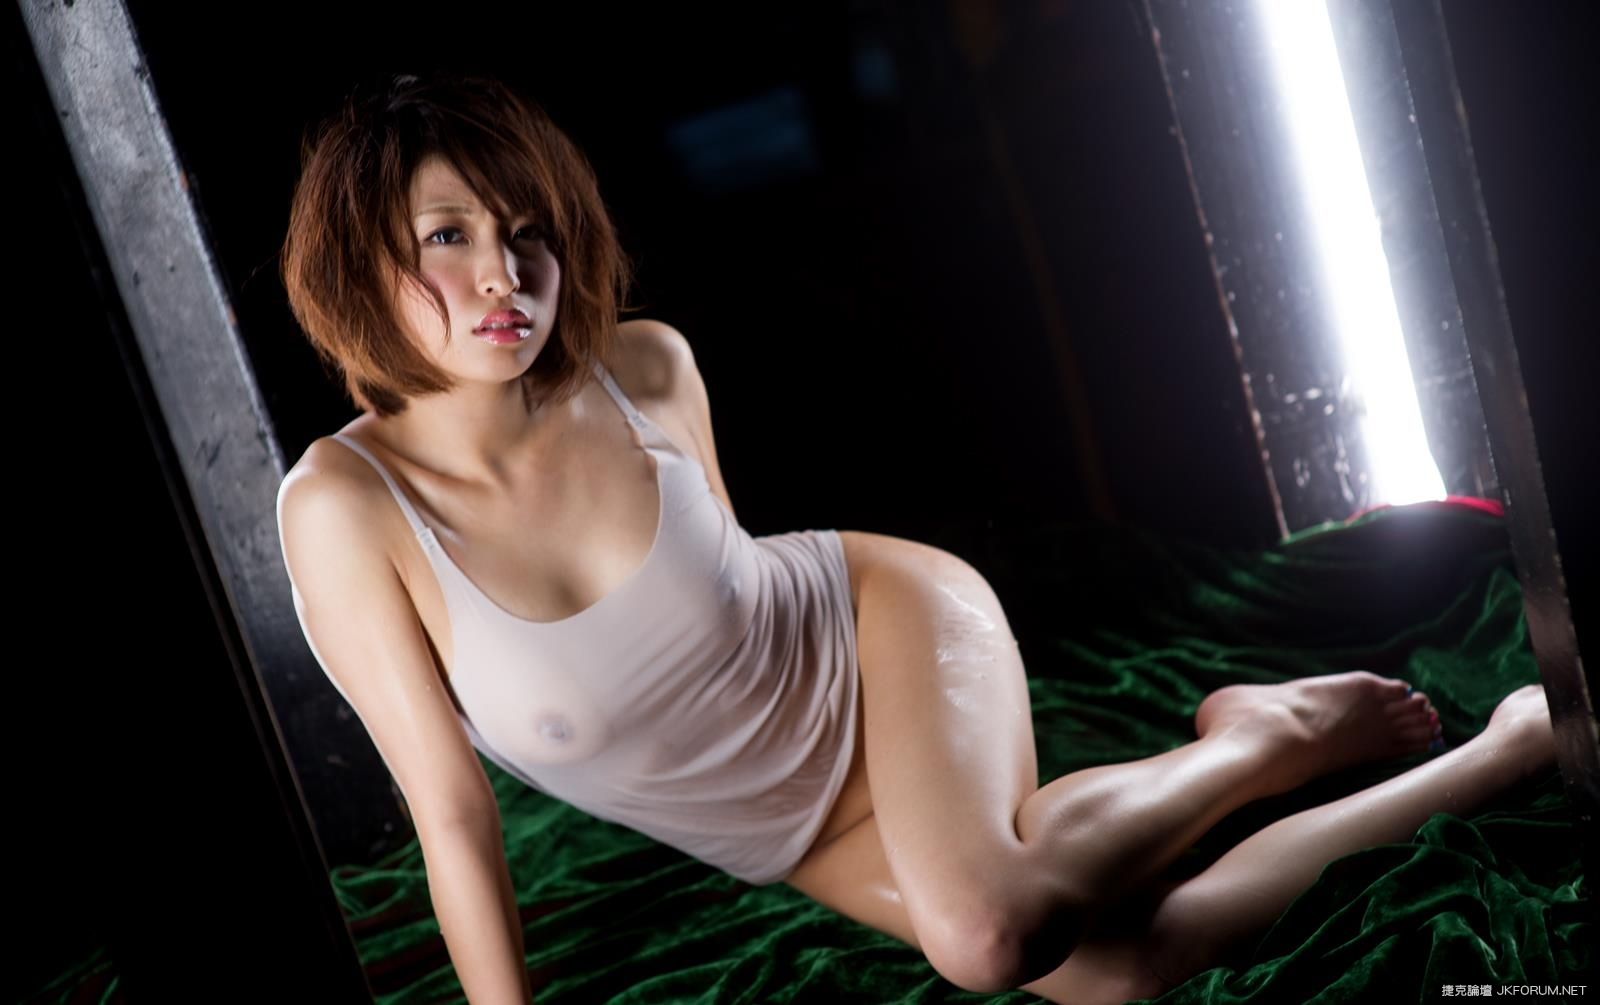 syouko-akiyama-1094_047.jpg